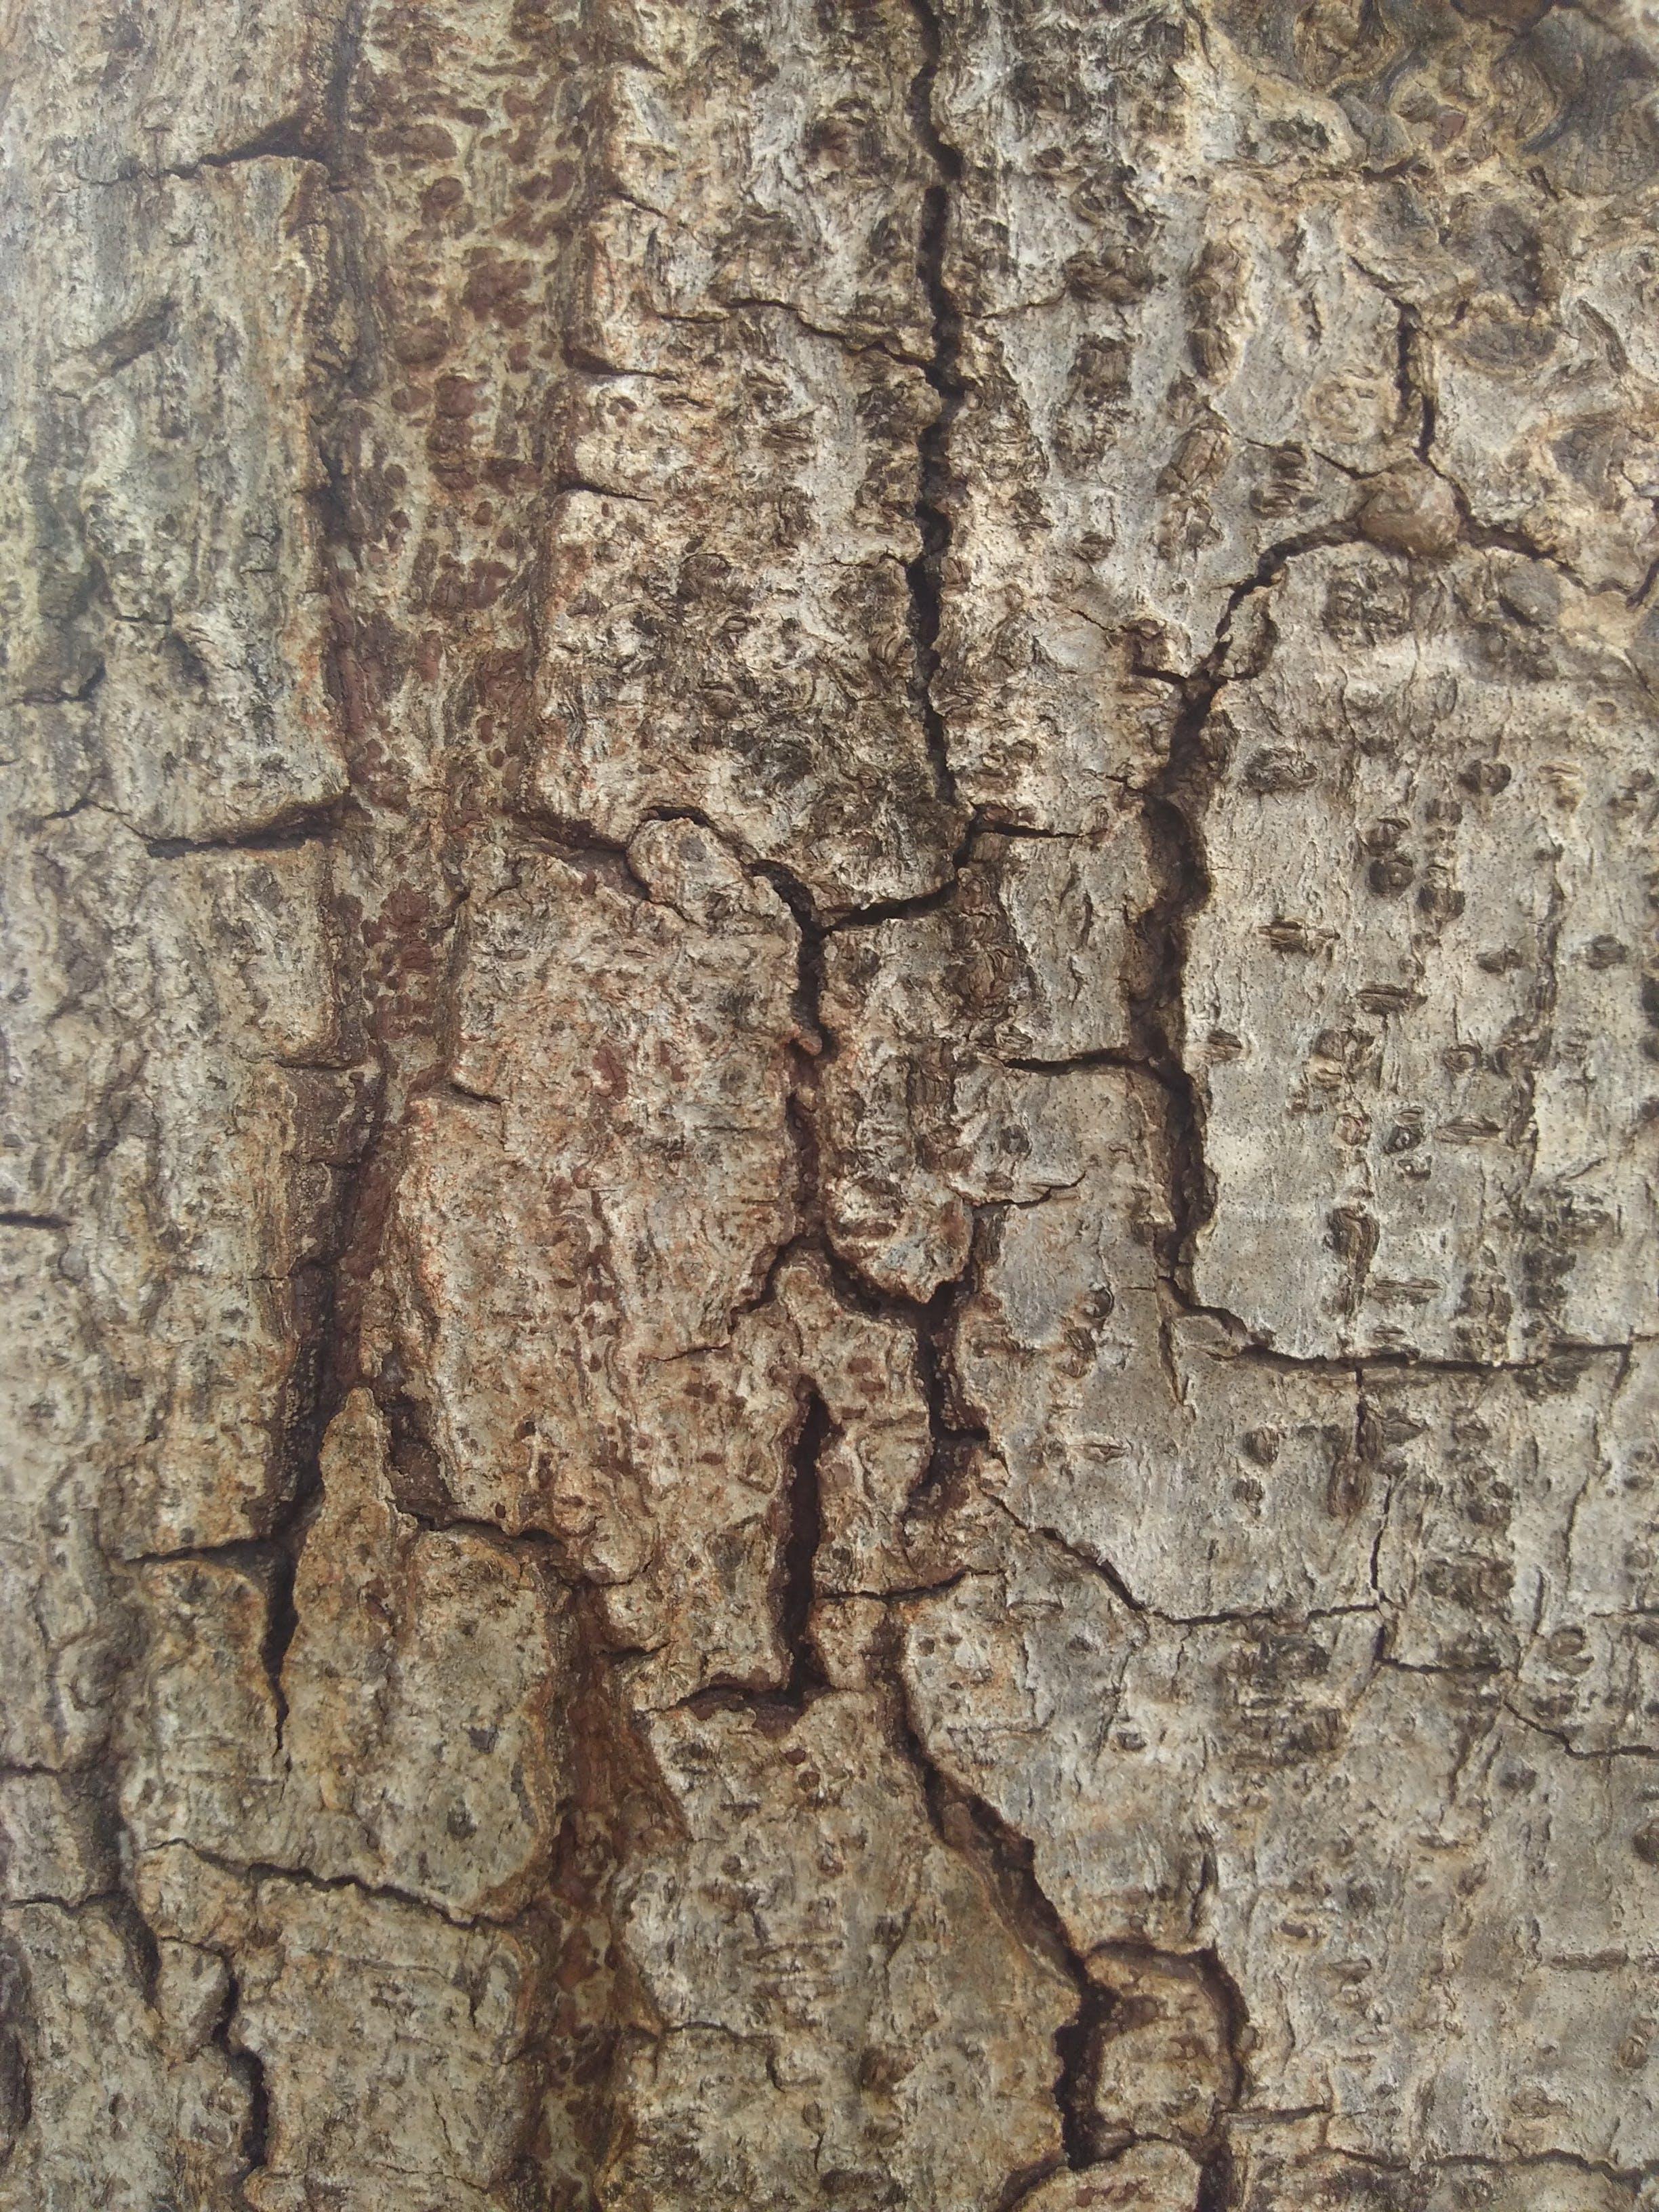 Free stock photo of tree trunk